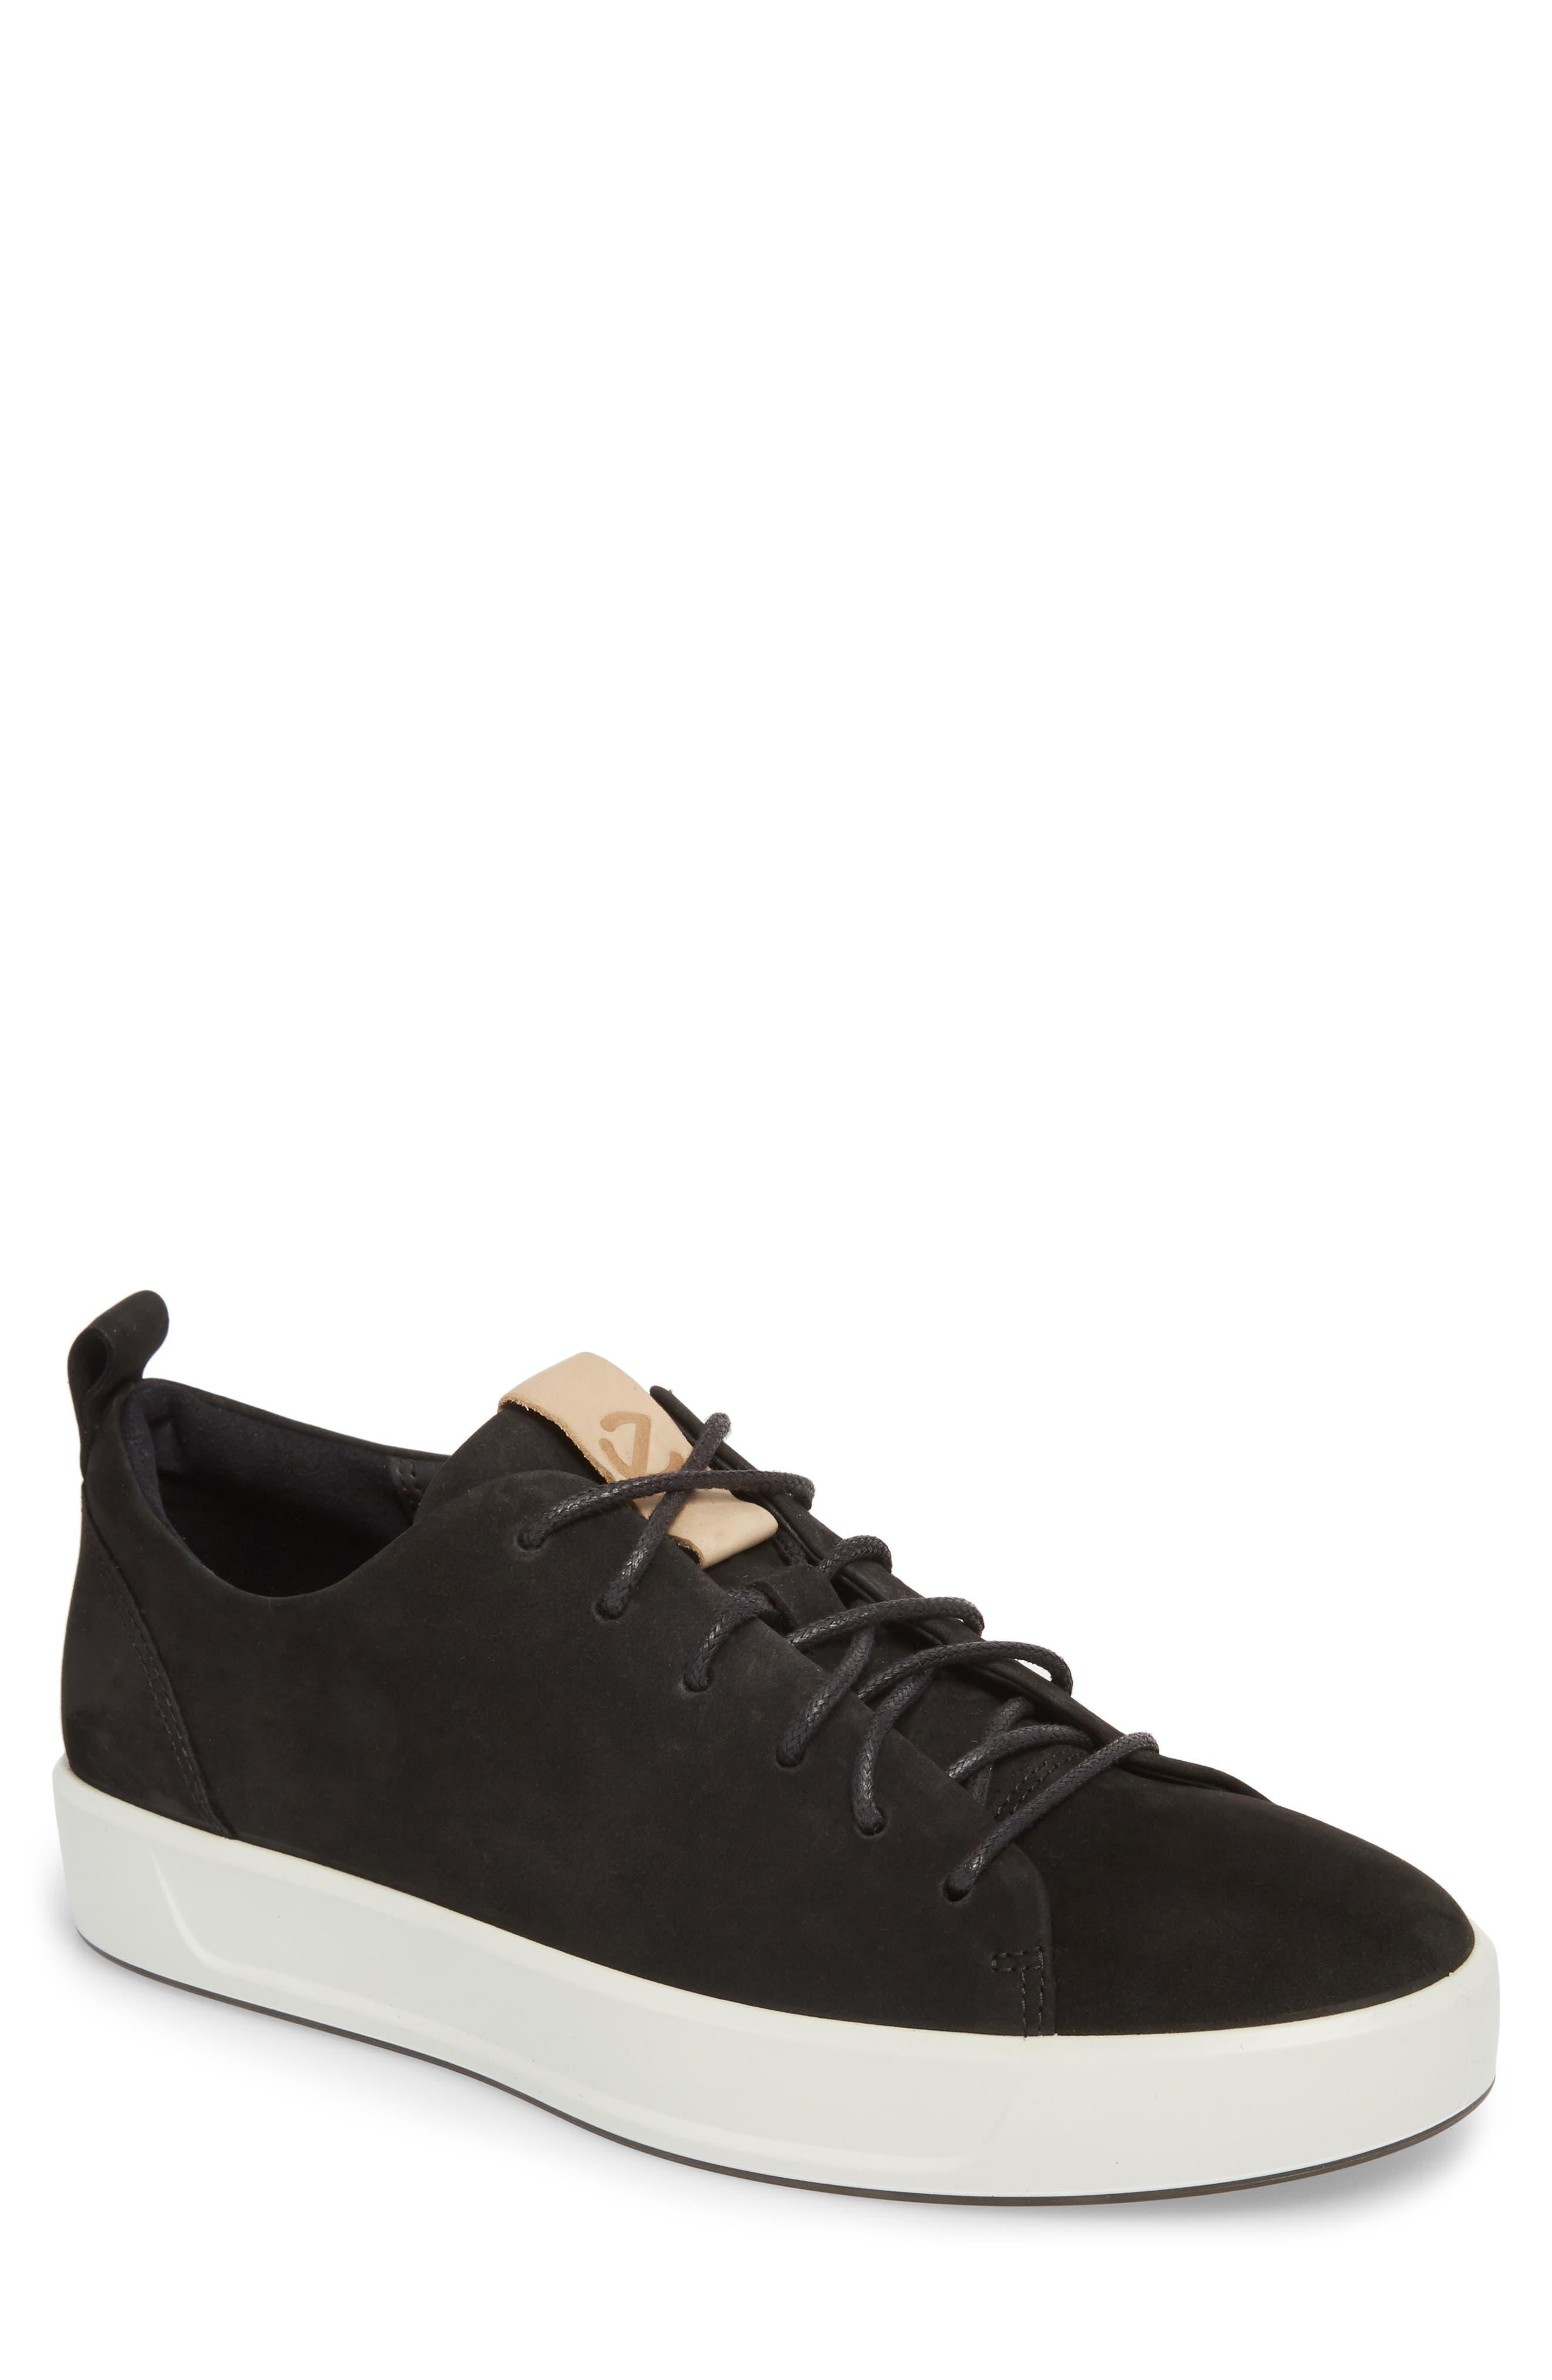 Soft 8 Sneaker,                         Main,                         color, BLACK POWDER LEATHER